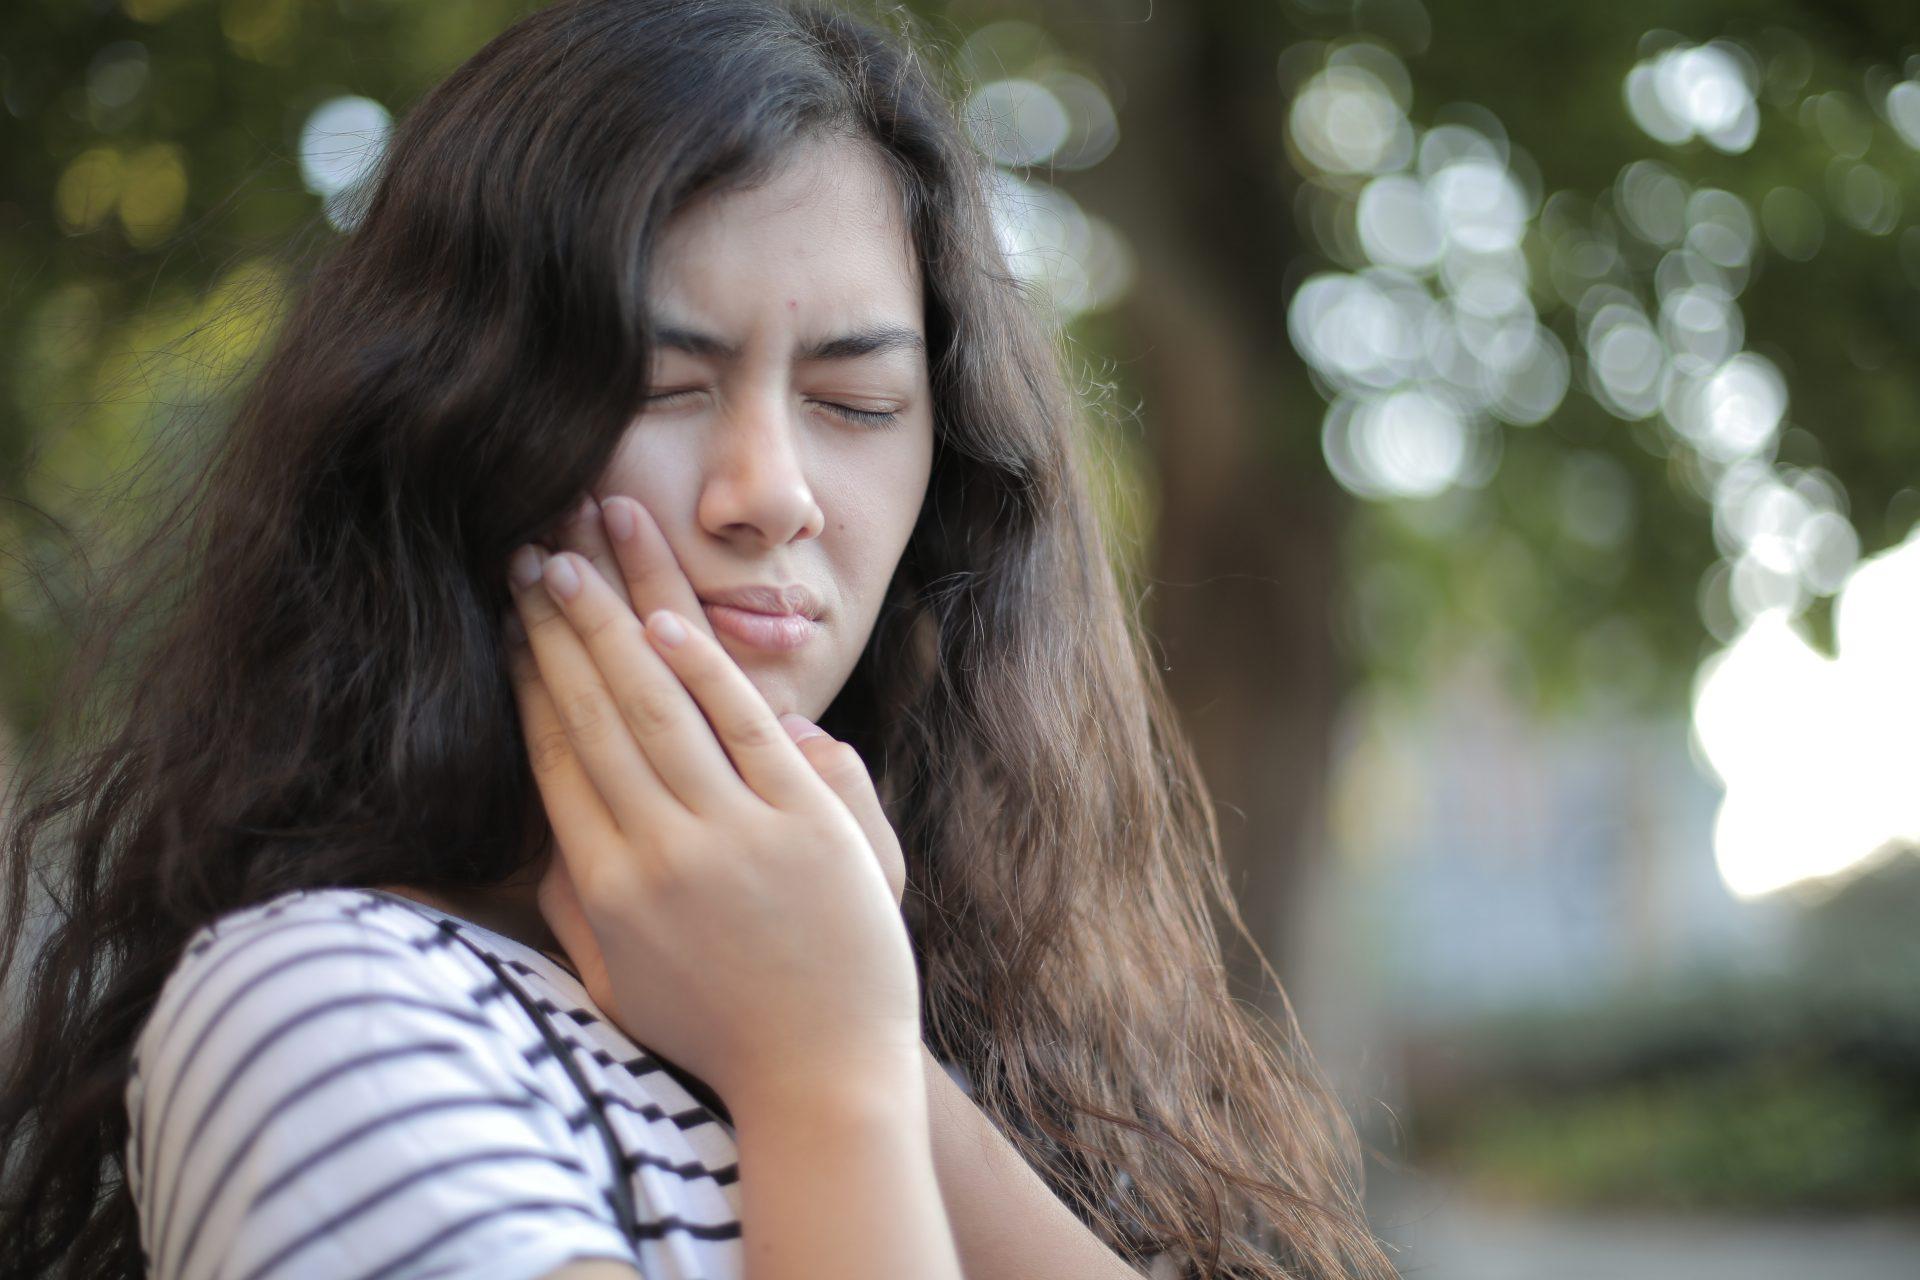 sps dental, tooth pain in kenosha, dentist near me